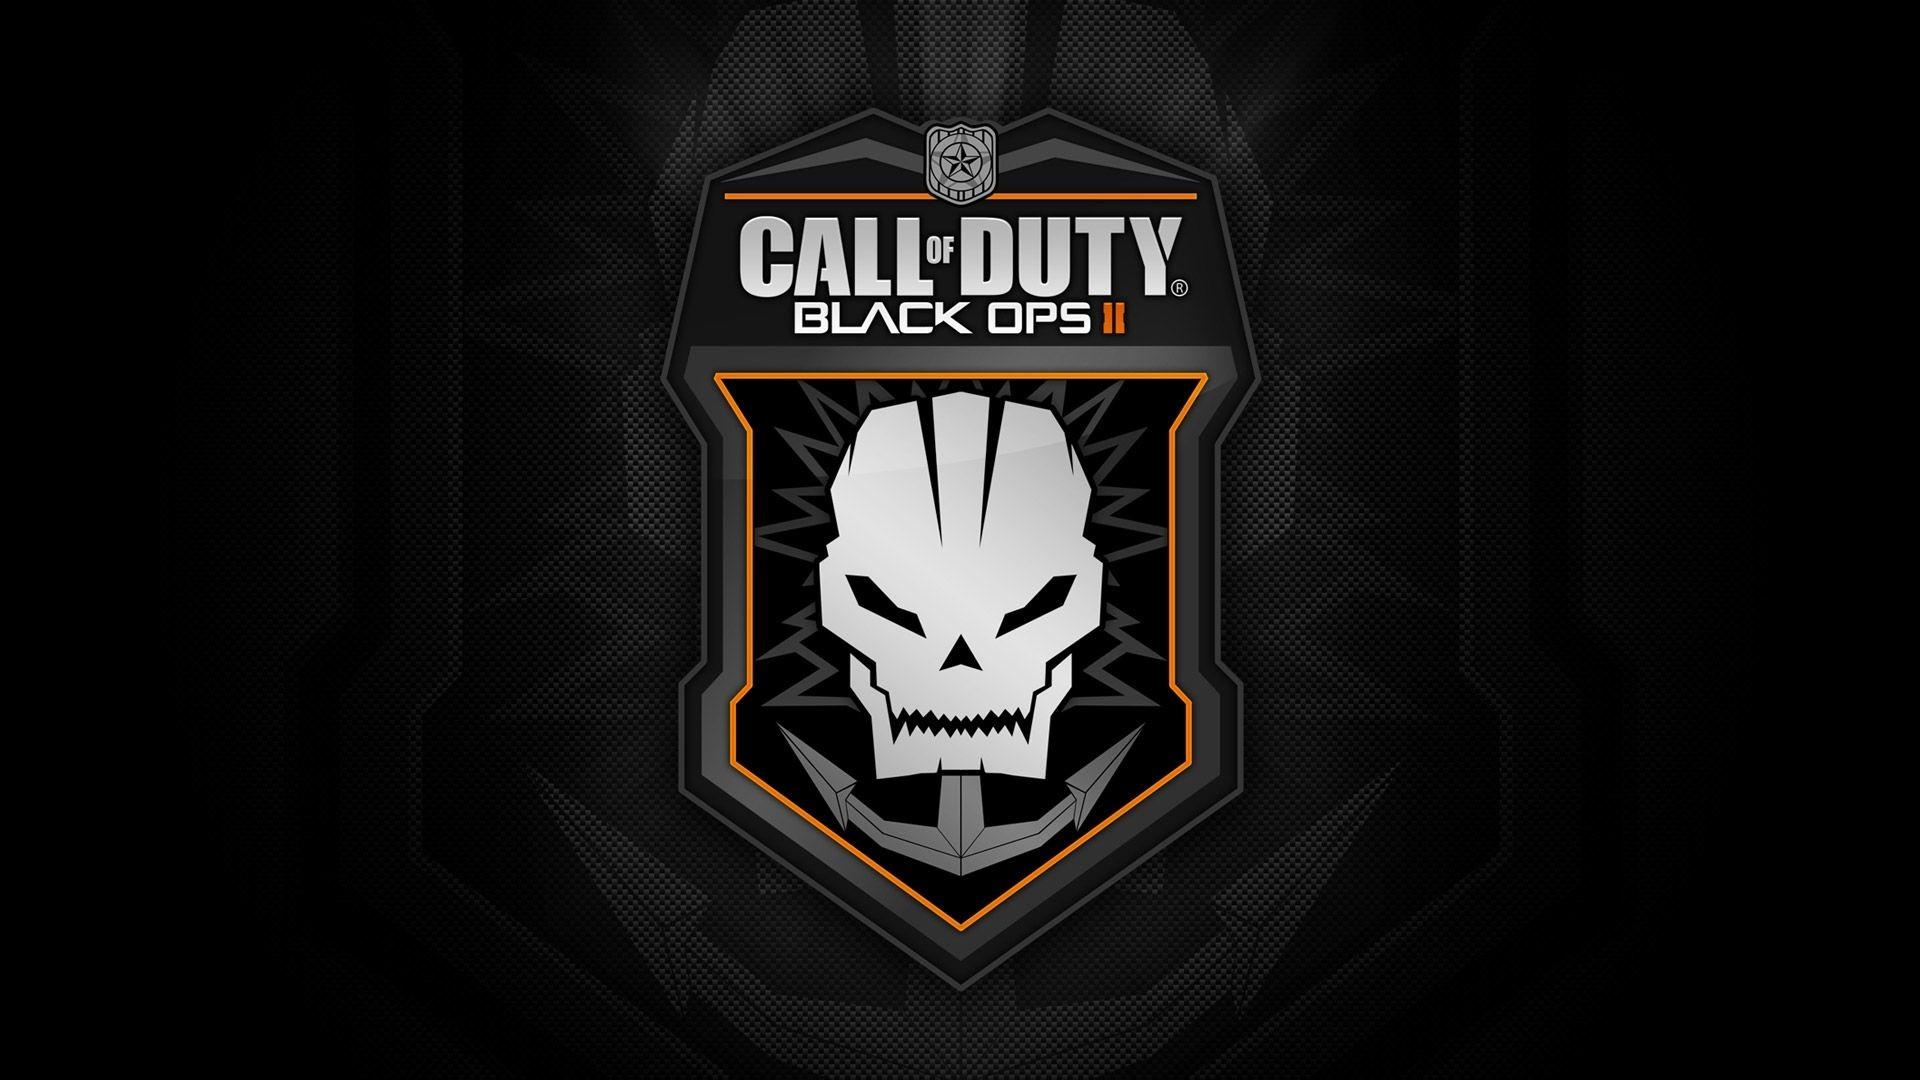 Call Of Duty Black Ops 3 Black Logo Wallpaper